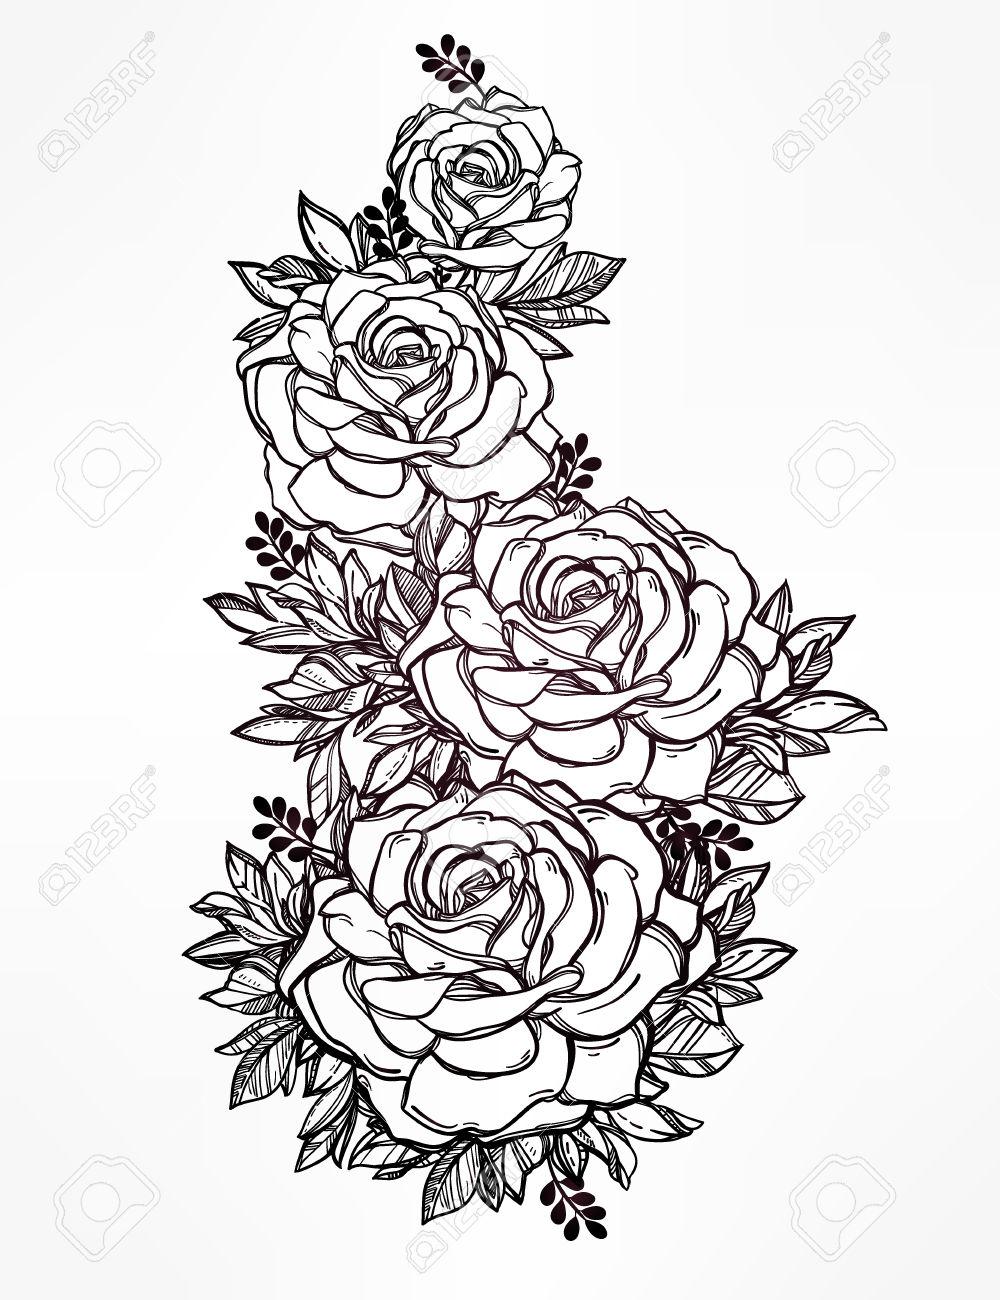 1000x1300 48005636 Vintage Floral Highly Detailed Hand Drawn Rose Flower